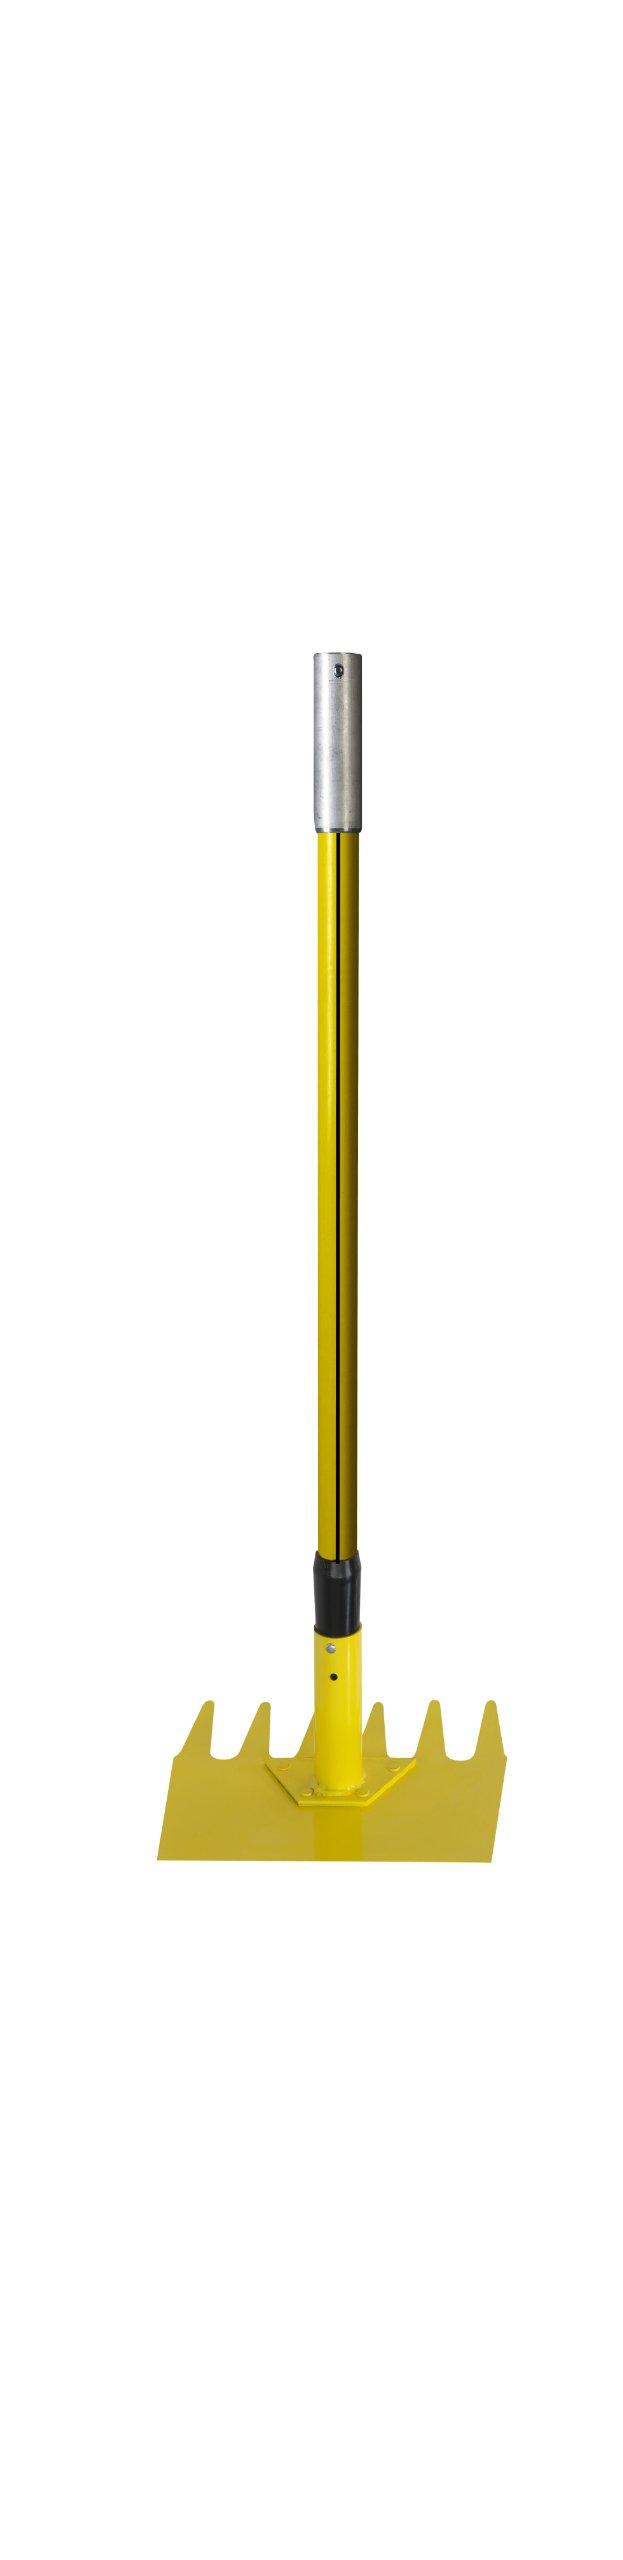 Nupla E-FHR NuPole Fire System McLeod Hoe/Rake Head, 3' Length